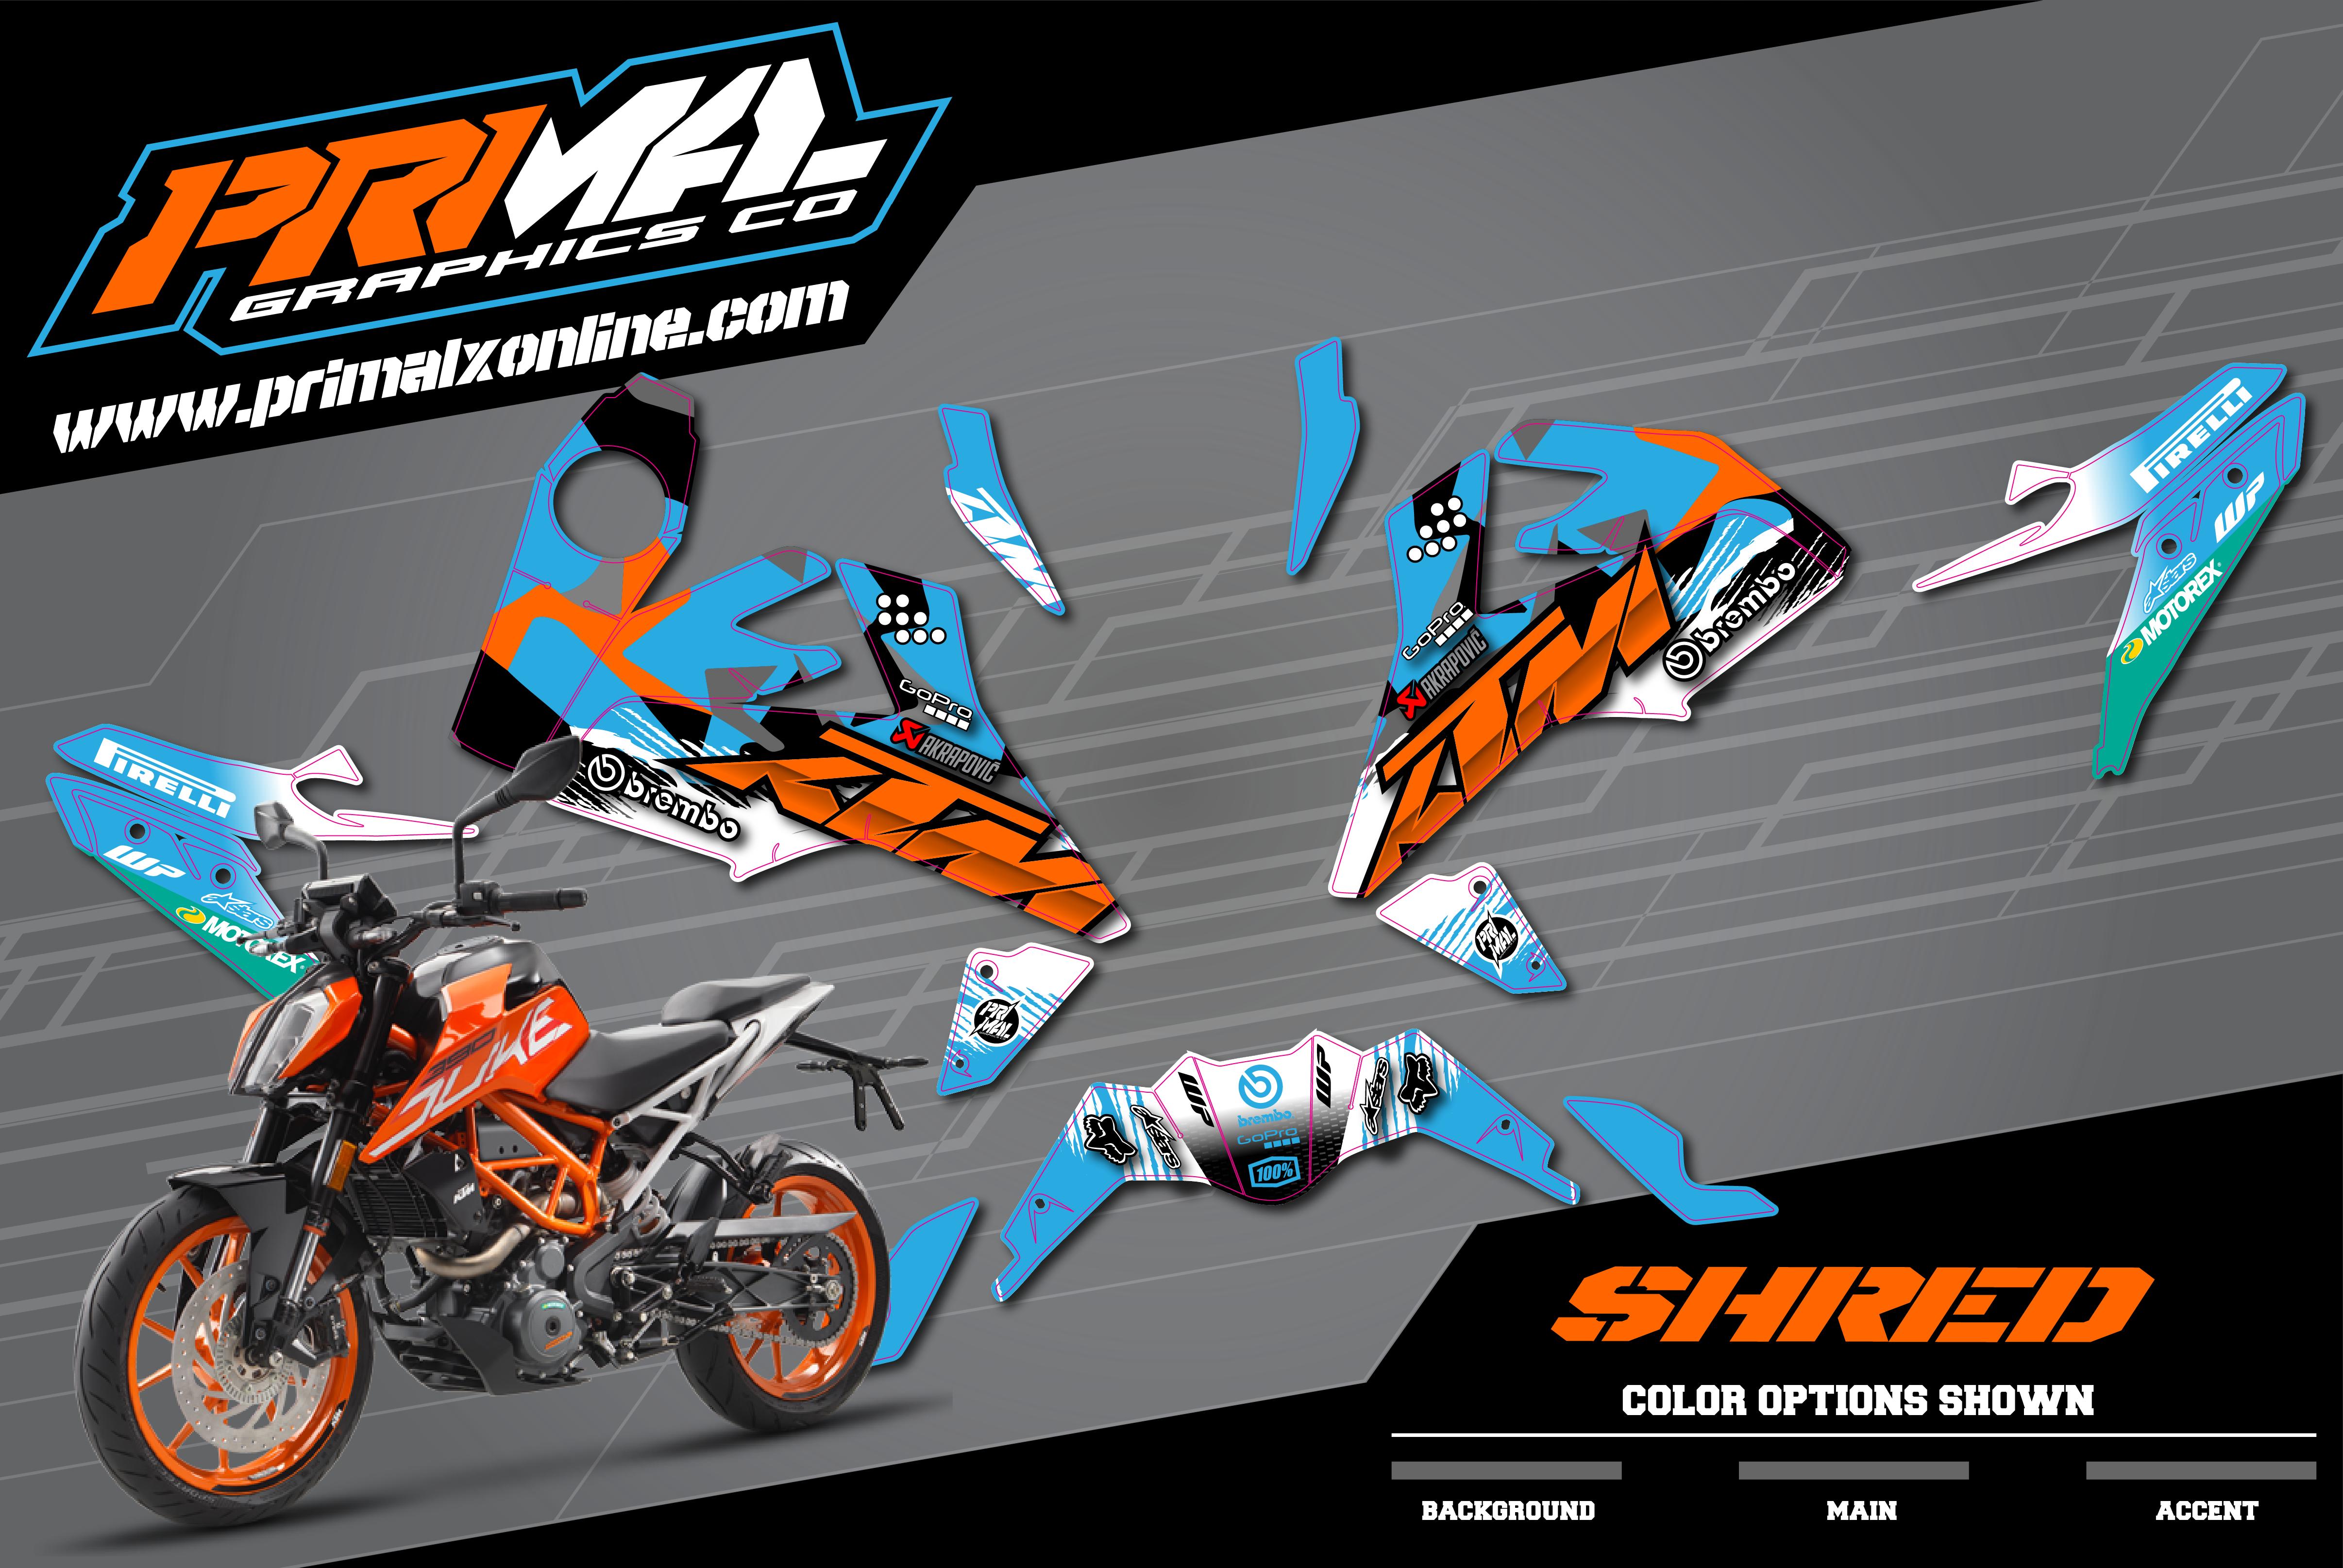 1_PRIMAL-X-MOTORSPORTS-PRIMAL-GRAPHICS-CO-KTM-DUKE-390-BIKELIFE-CHARMCITY-KINGS-MX-GRAPHICS-MX-DECALS-01